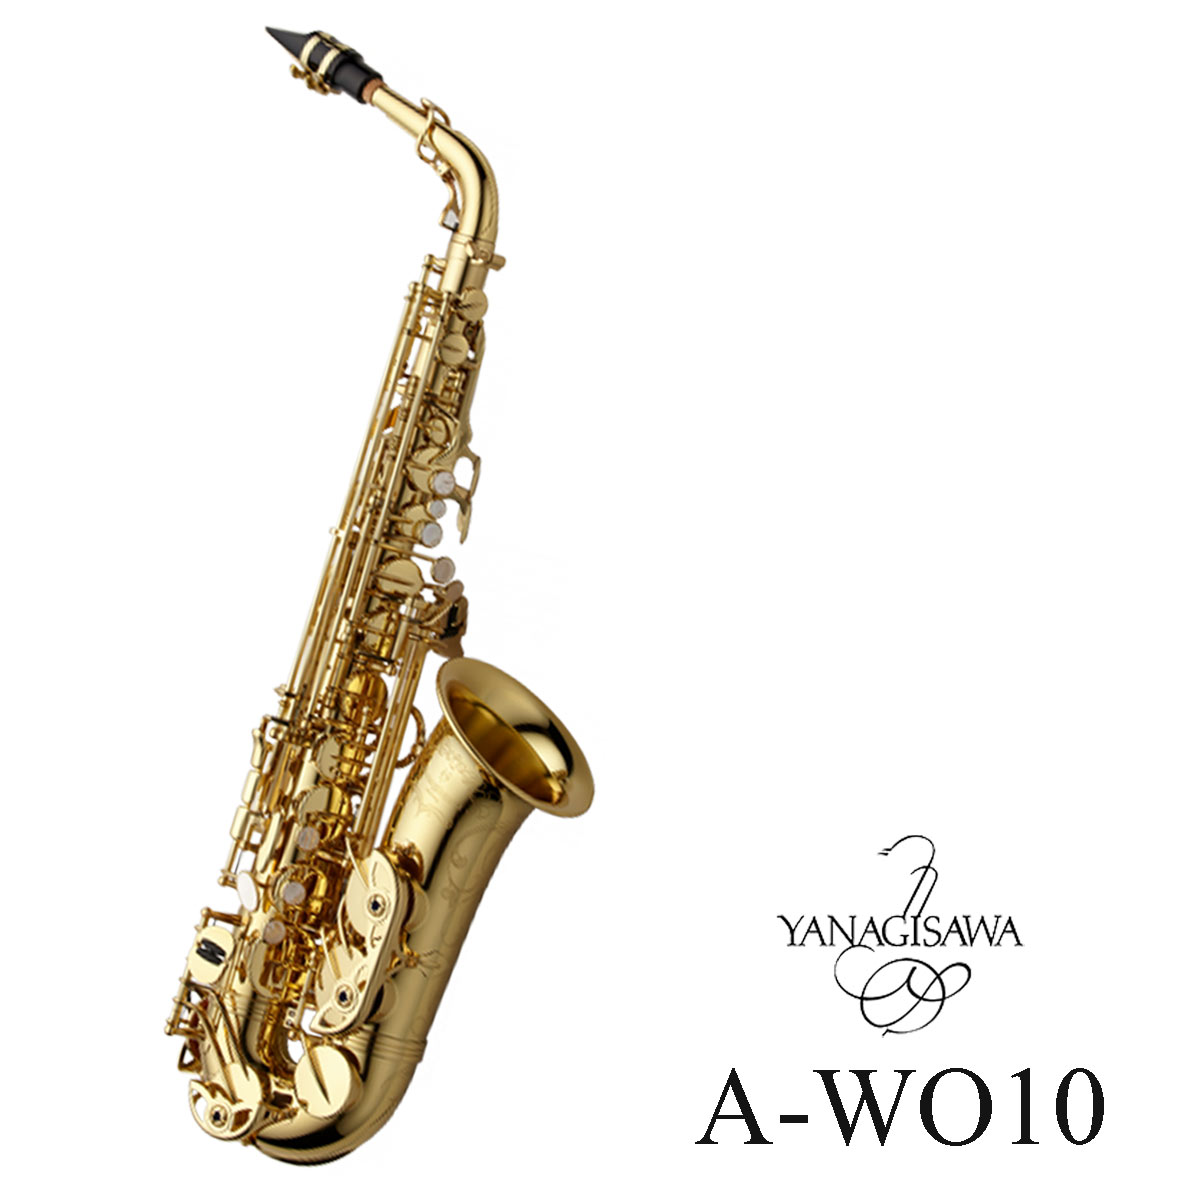 Yanagisawa / A-WO10 ヤナギサワ アルトサックス ダブルオーシリーズイエローブラス ラッカー仕上 《予約受付中:納期ご相談ください》【5年保証】